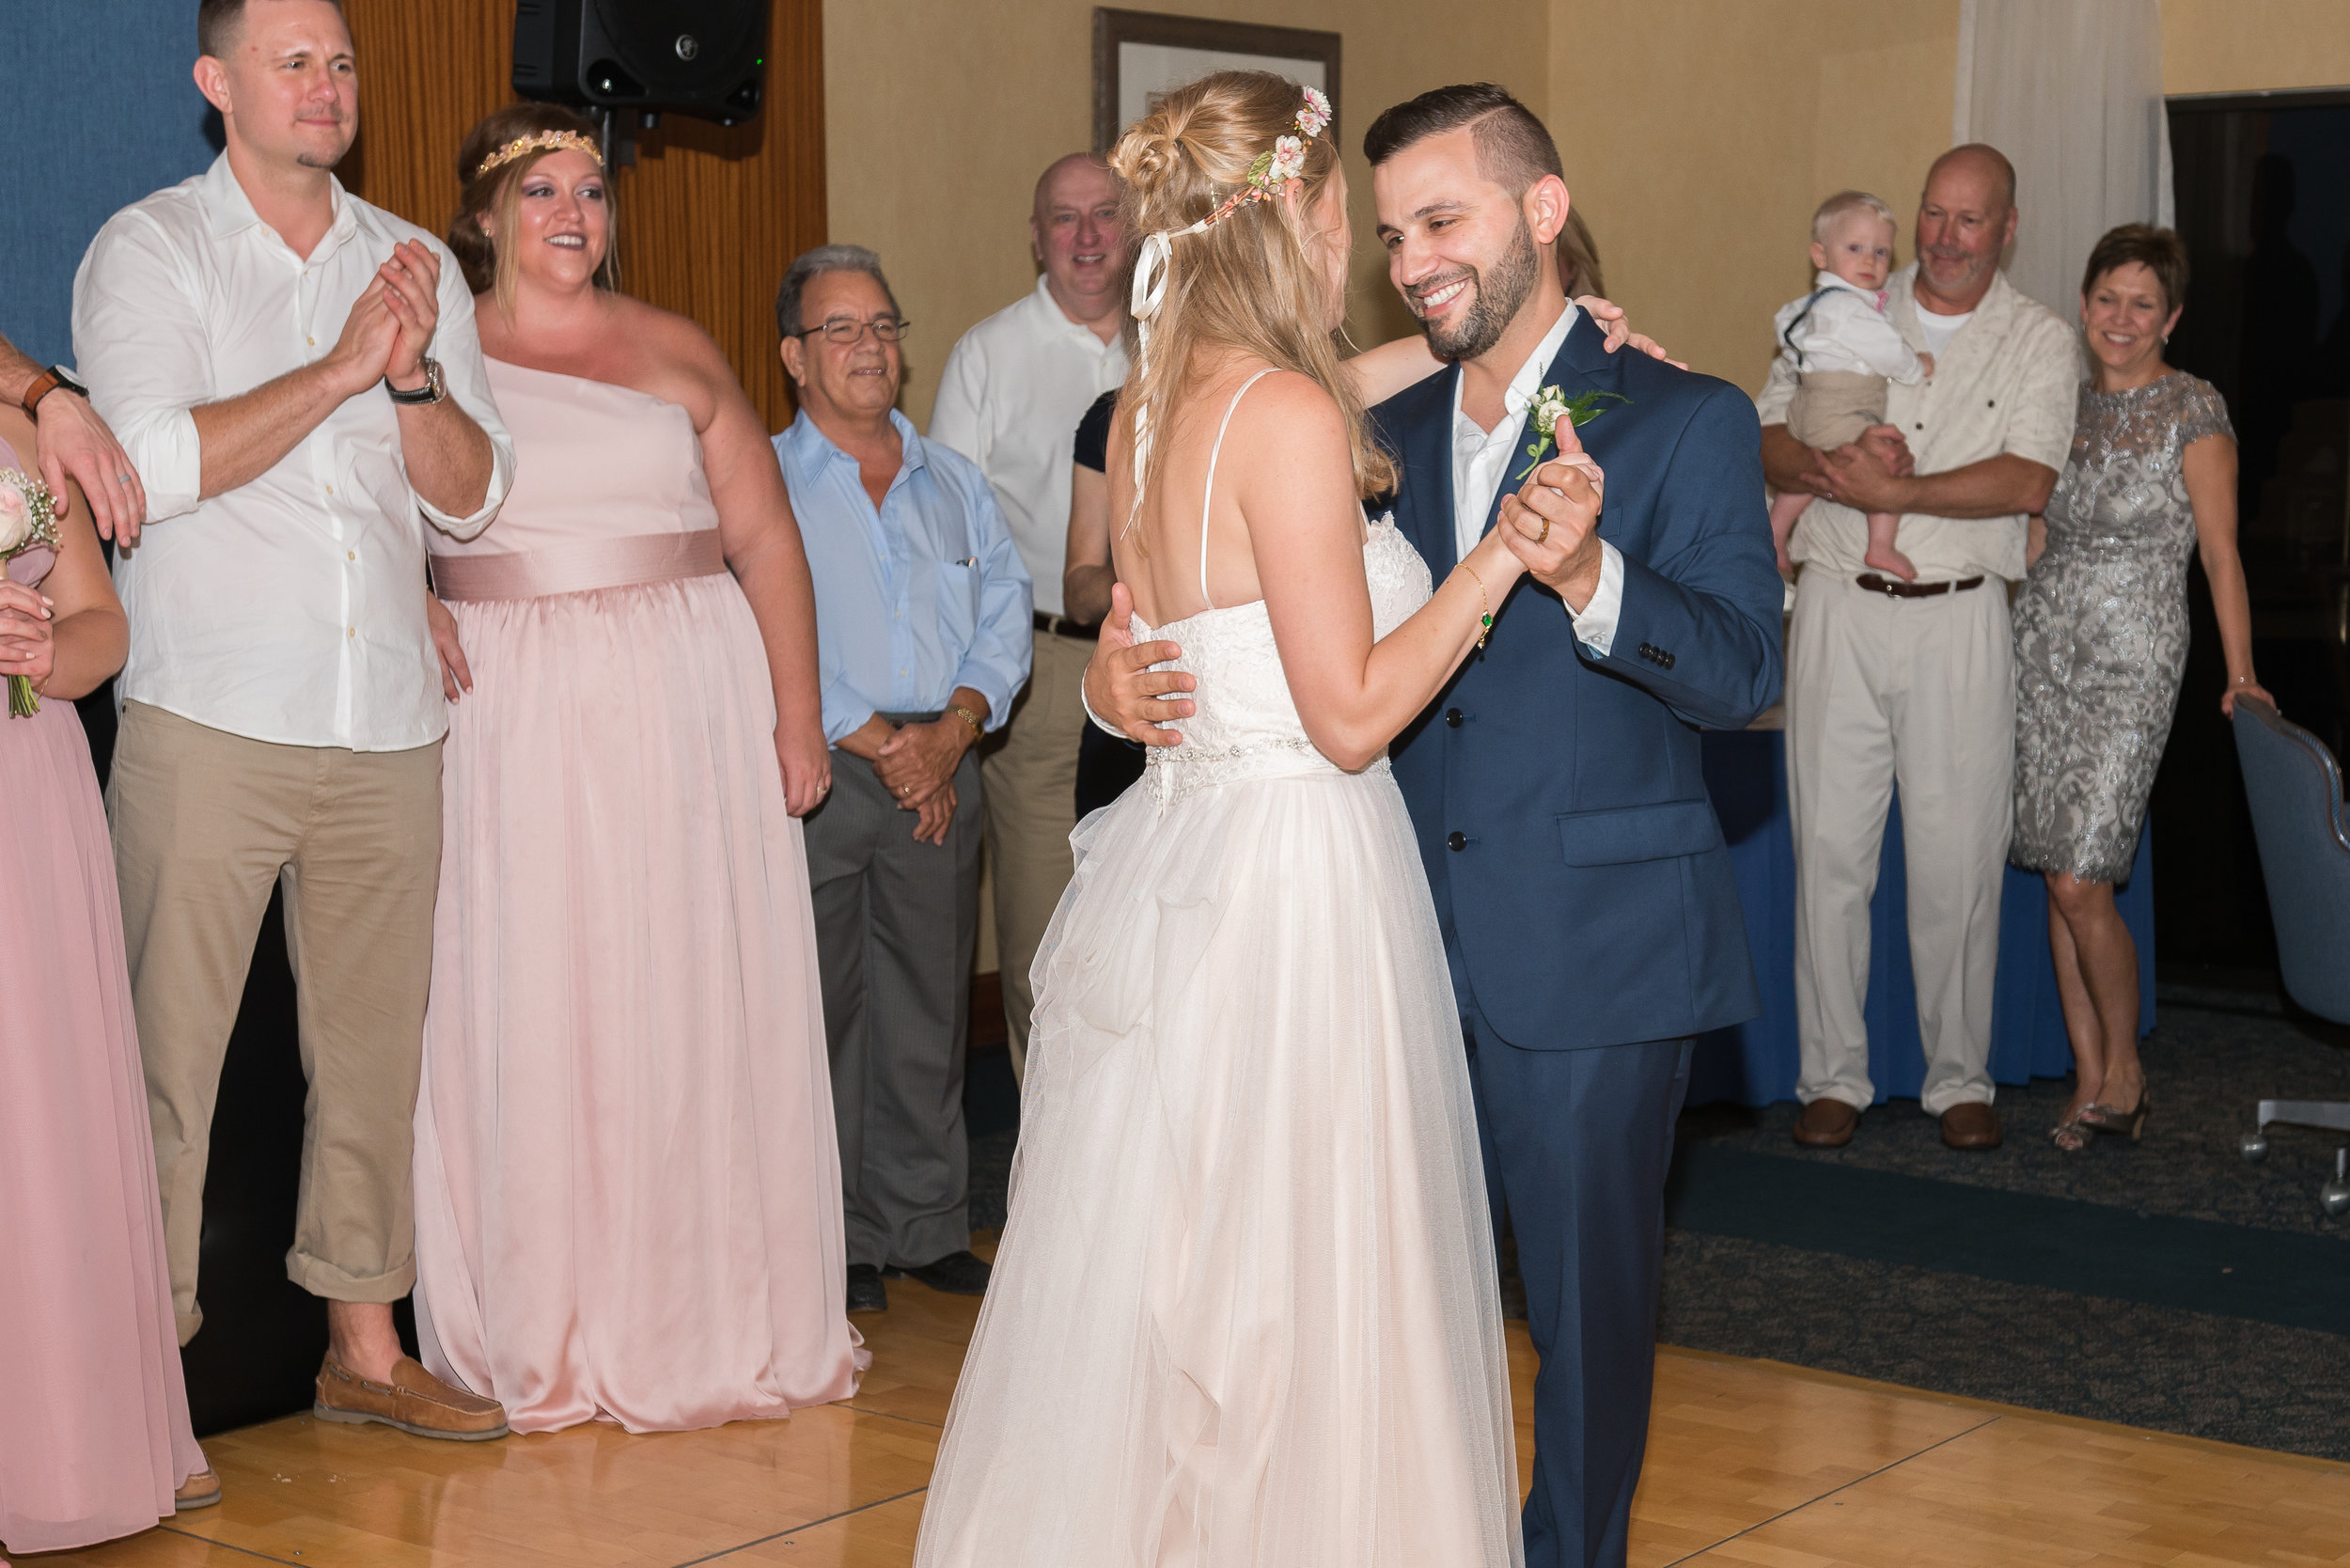 St.Petersburg wedding photographer, St.Pete wedding, Beach wedding, Beach wedding photographer, Tampa wedding photographer, Mir Salgado Photography, first dance